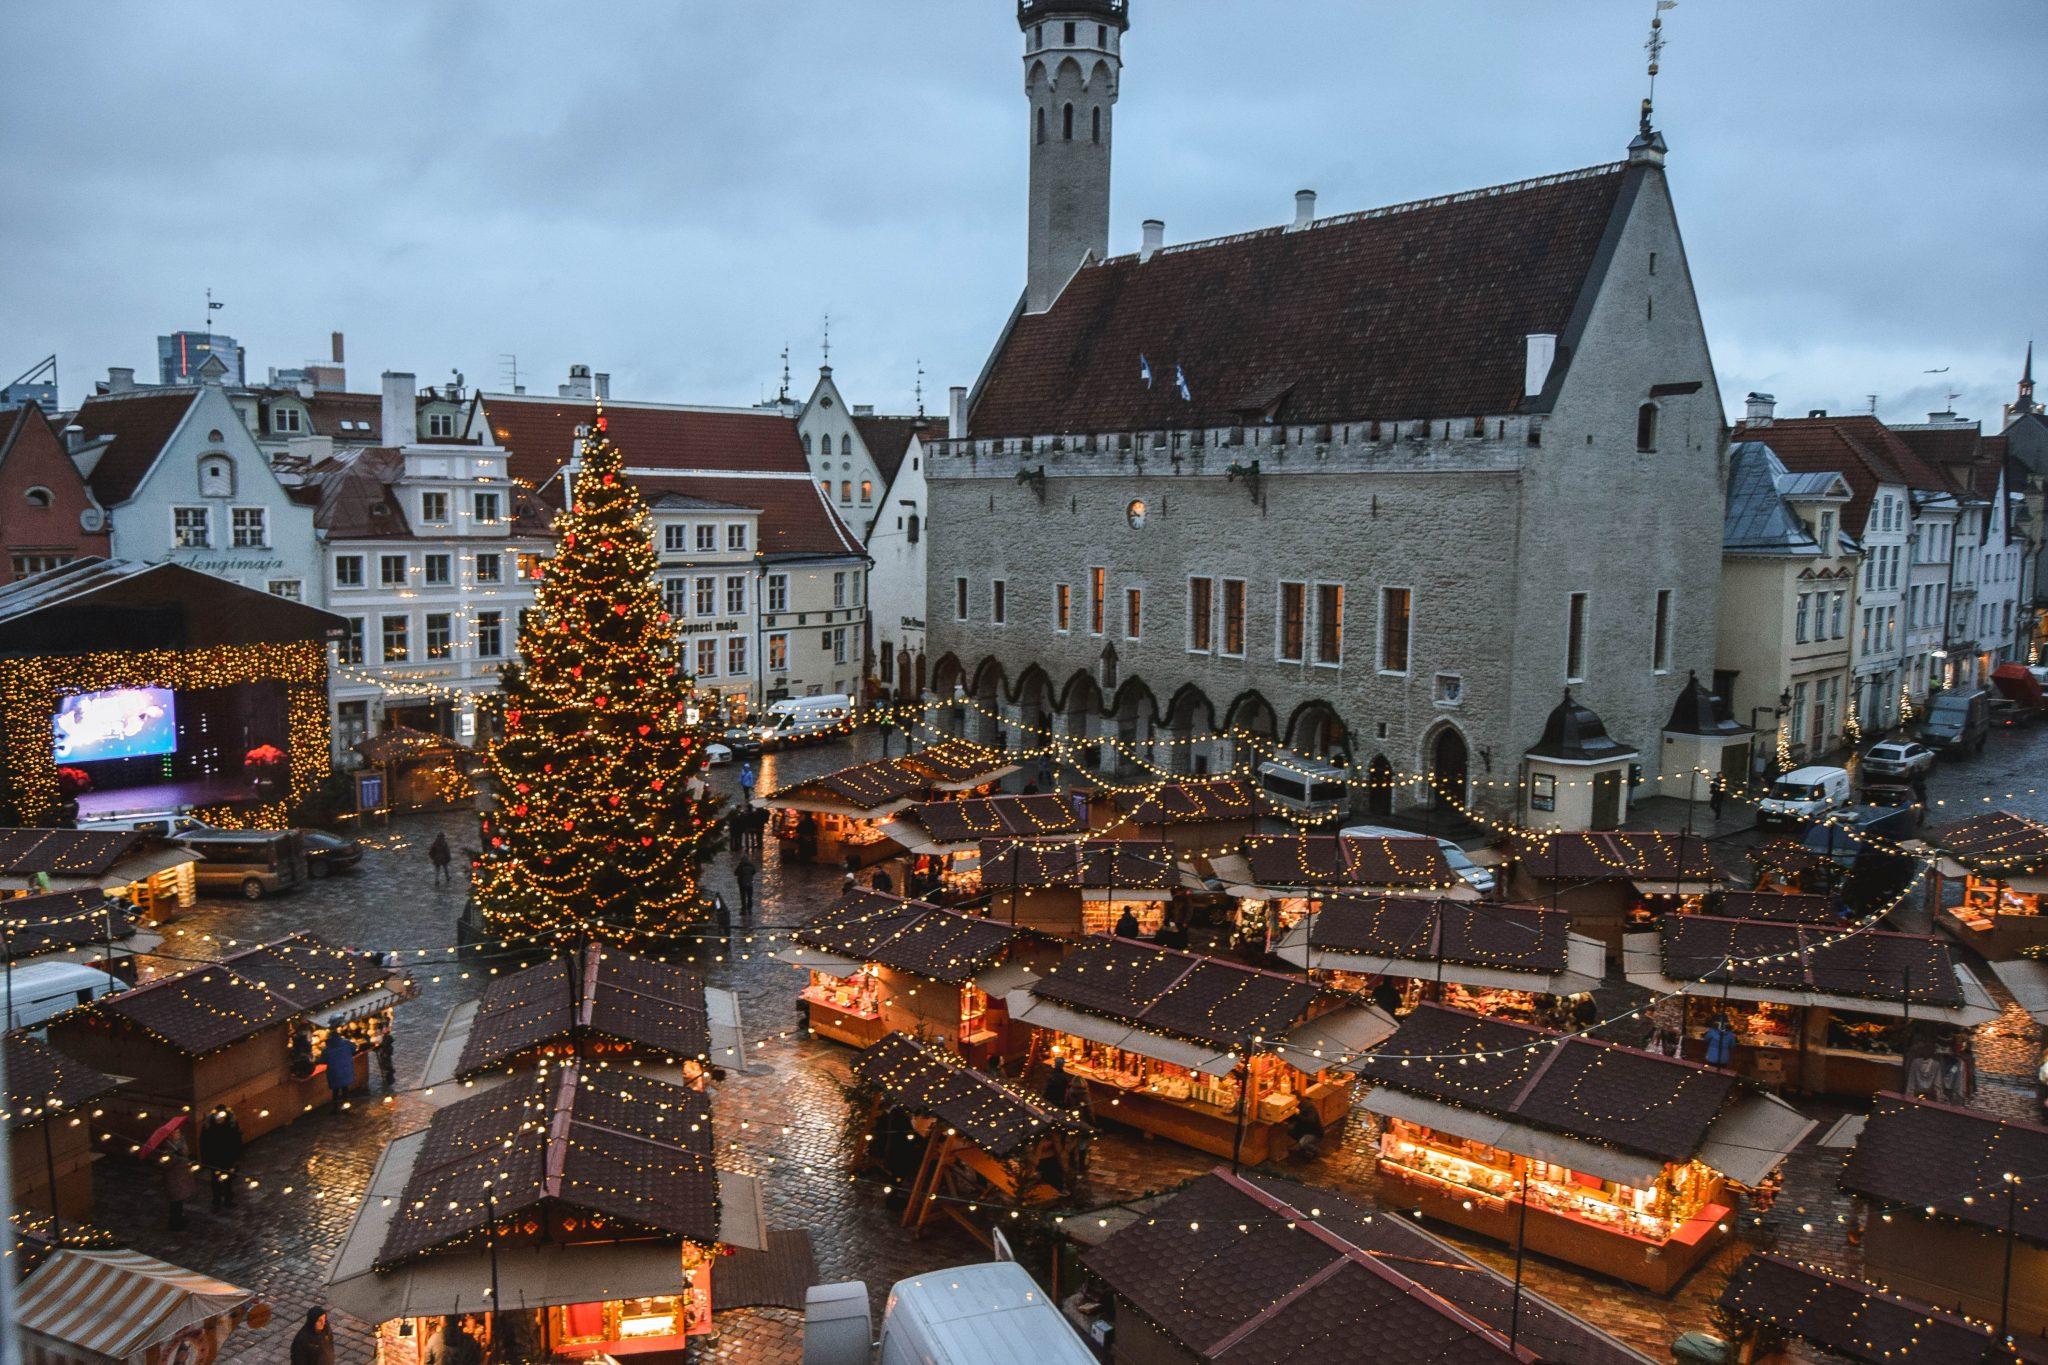 Things To Do In Tallinn In Winter Tallinn Things To Do - Town Square Christmas Market Tallinn Estonia